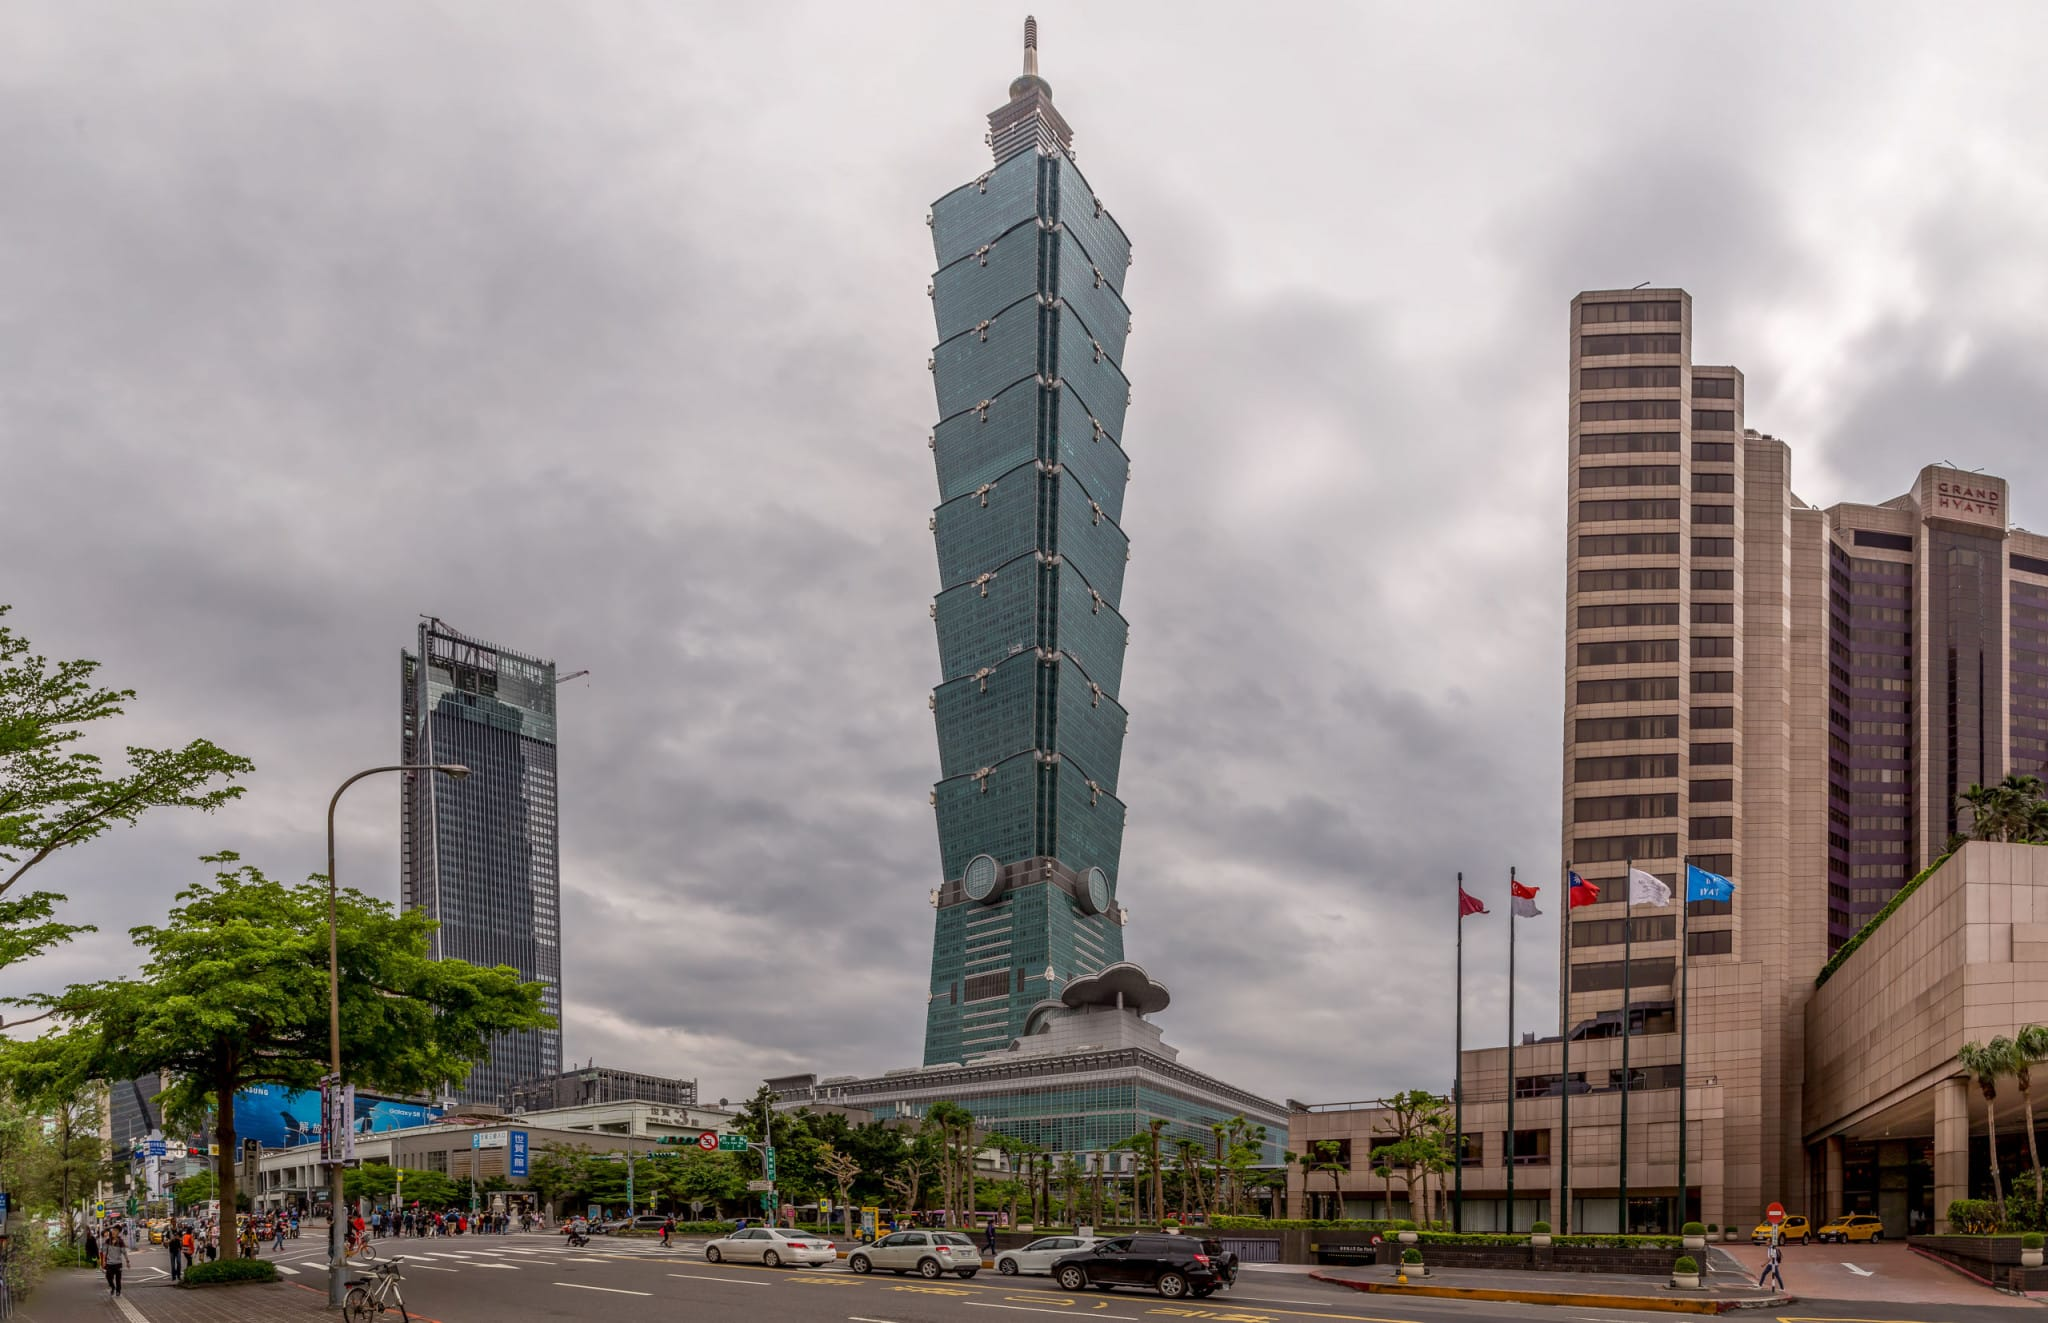 TAIWAN - Ultimate 14 days Taiwan road trip itinerary around the island